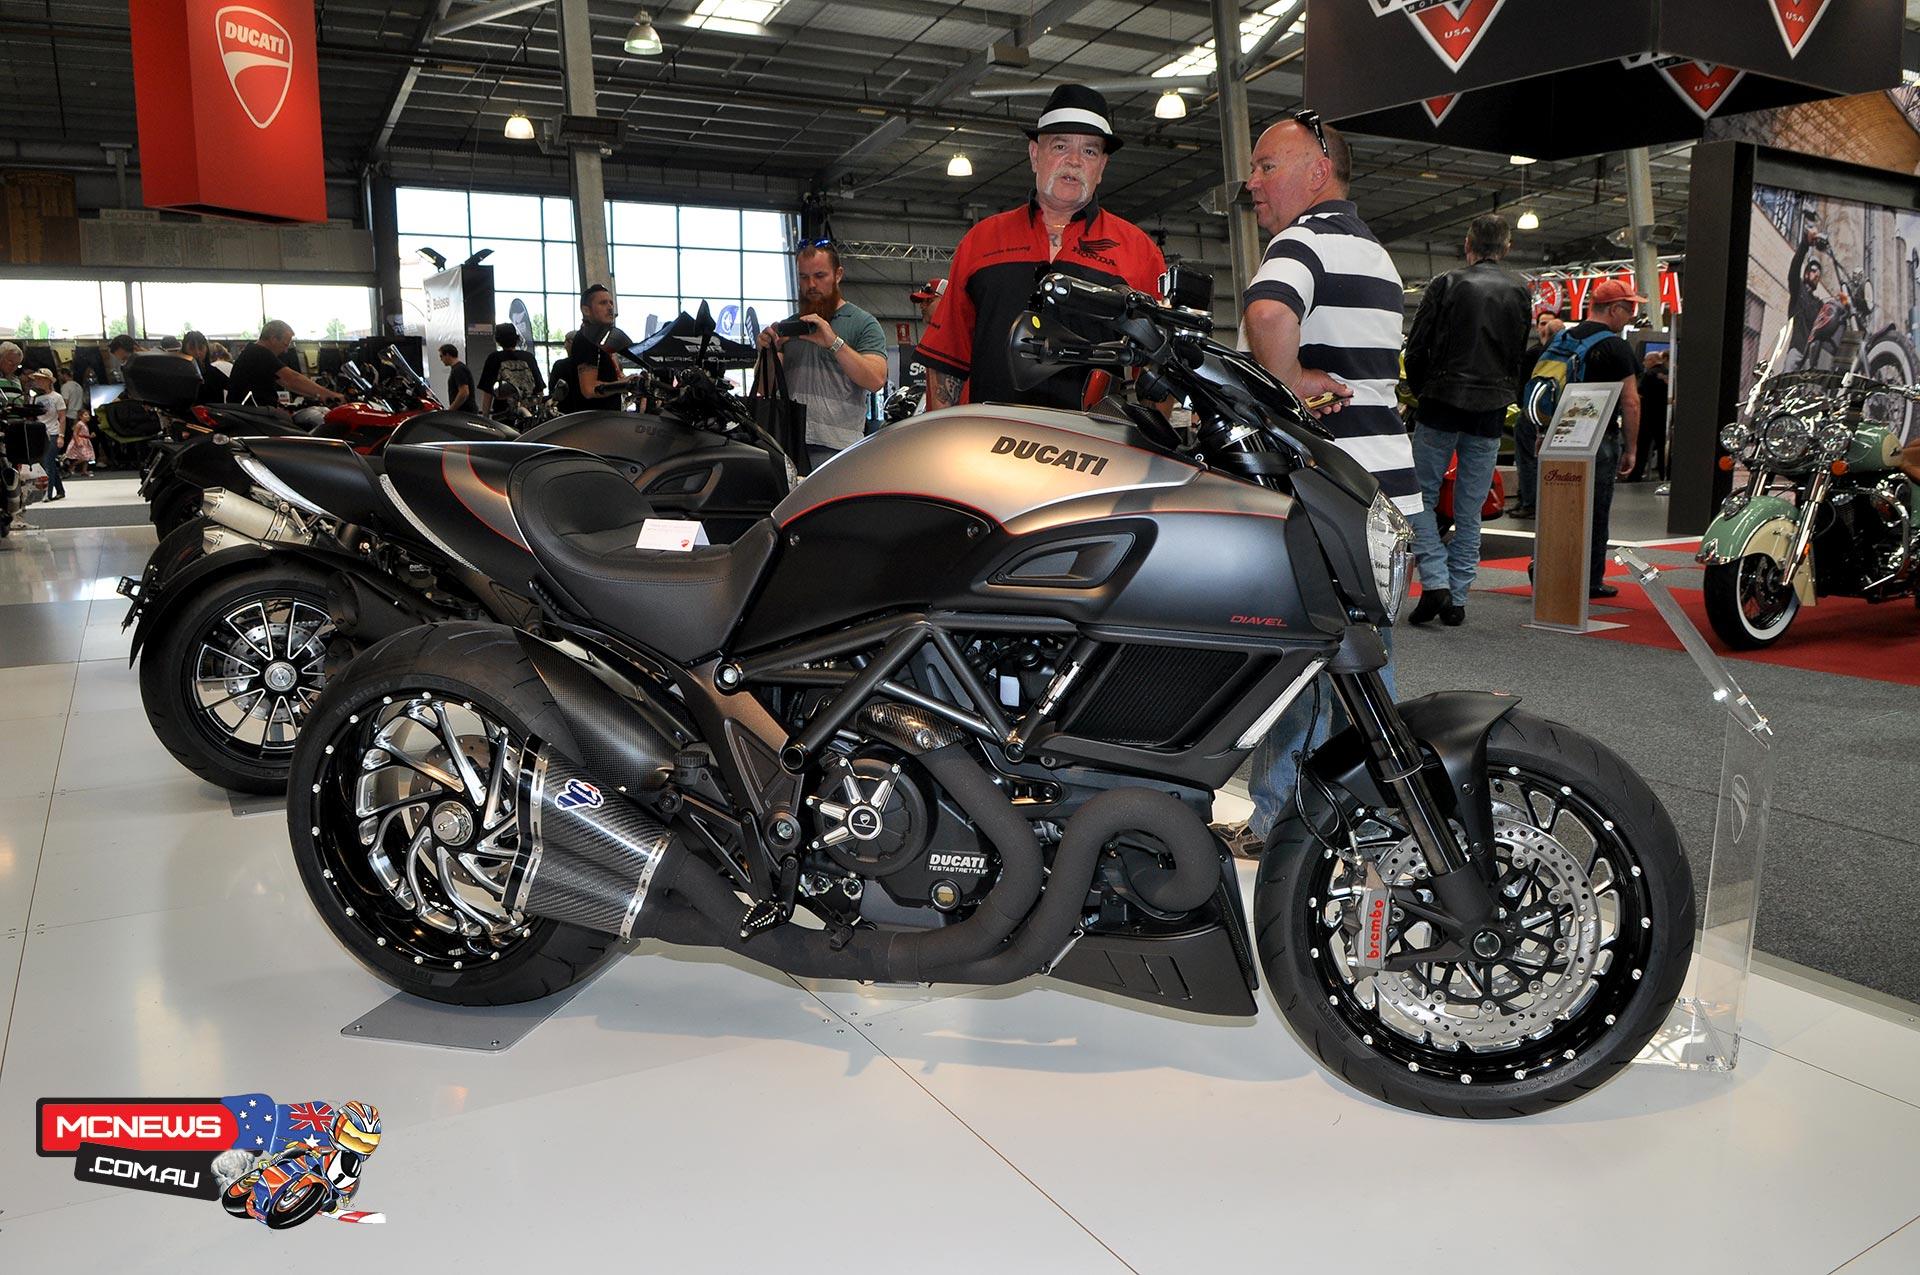 Ducati on display at Moto Expo